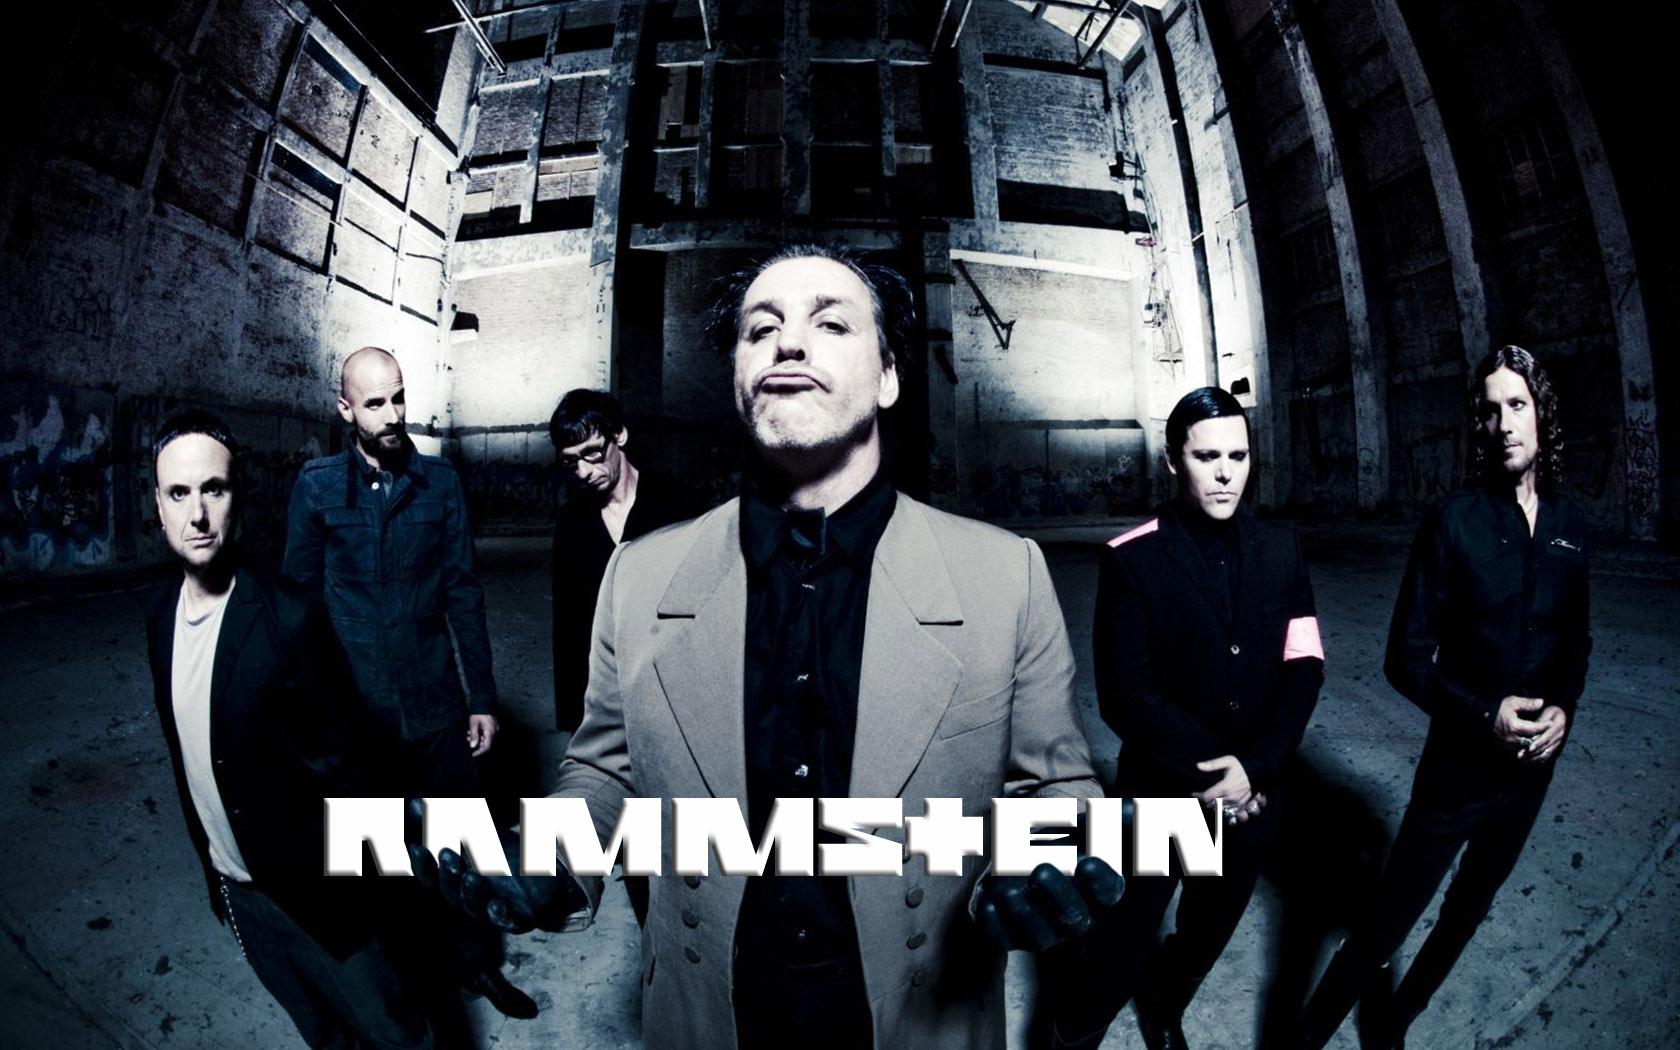 Rammstein - обои на рабочий стол 1680x1050